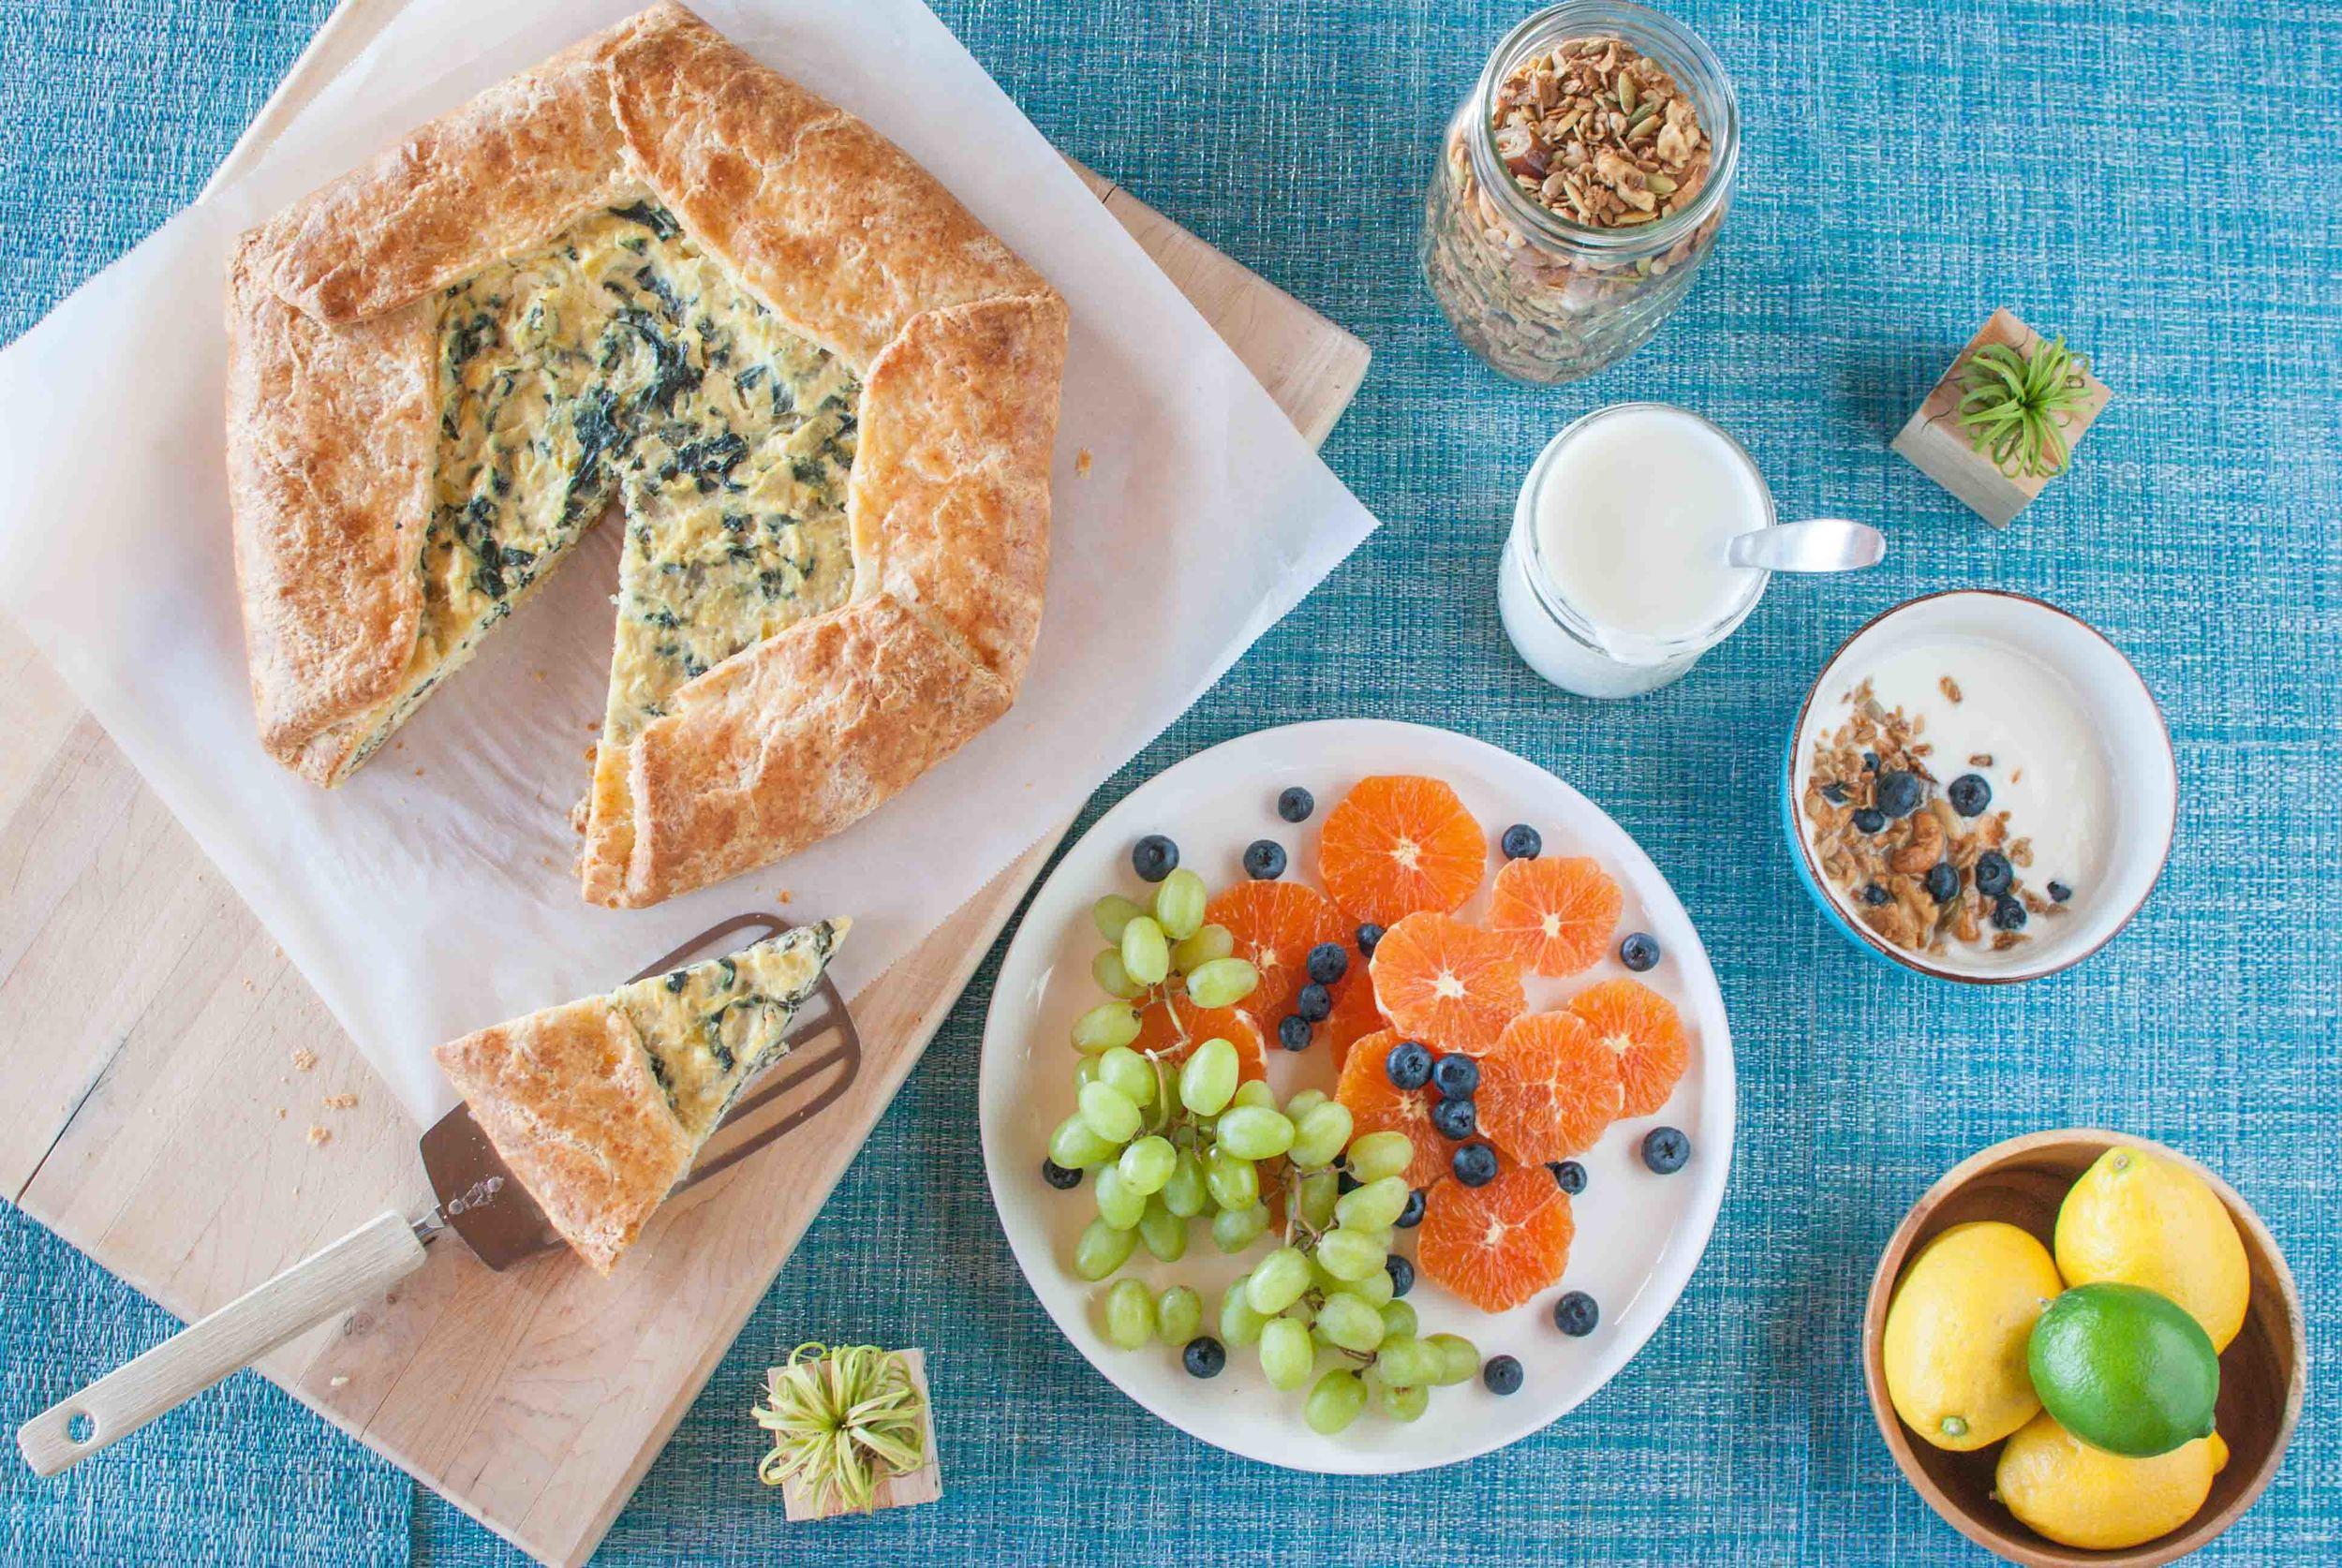 Swiss Chard and Leek Crostata with Homemade Yogurt and Olive Oil Granola